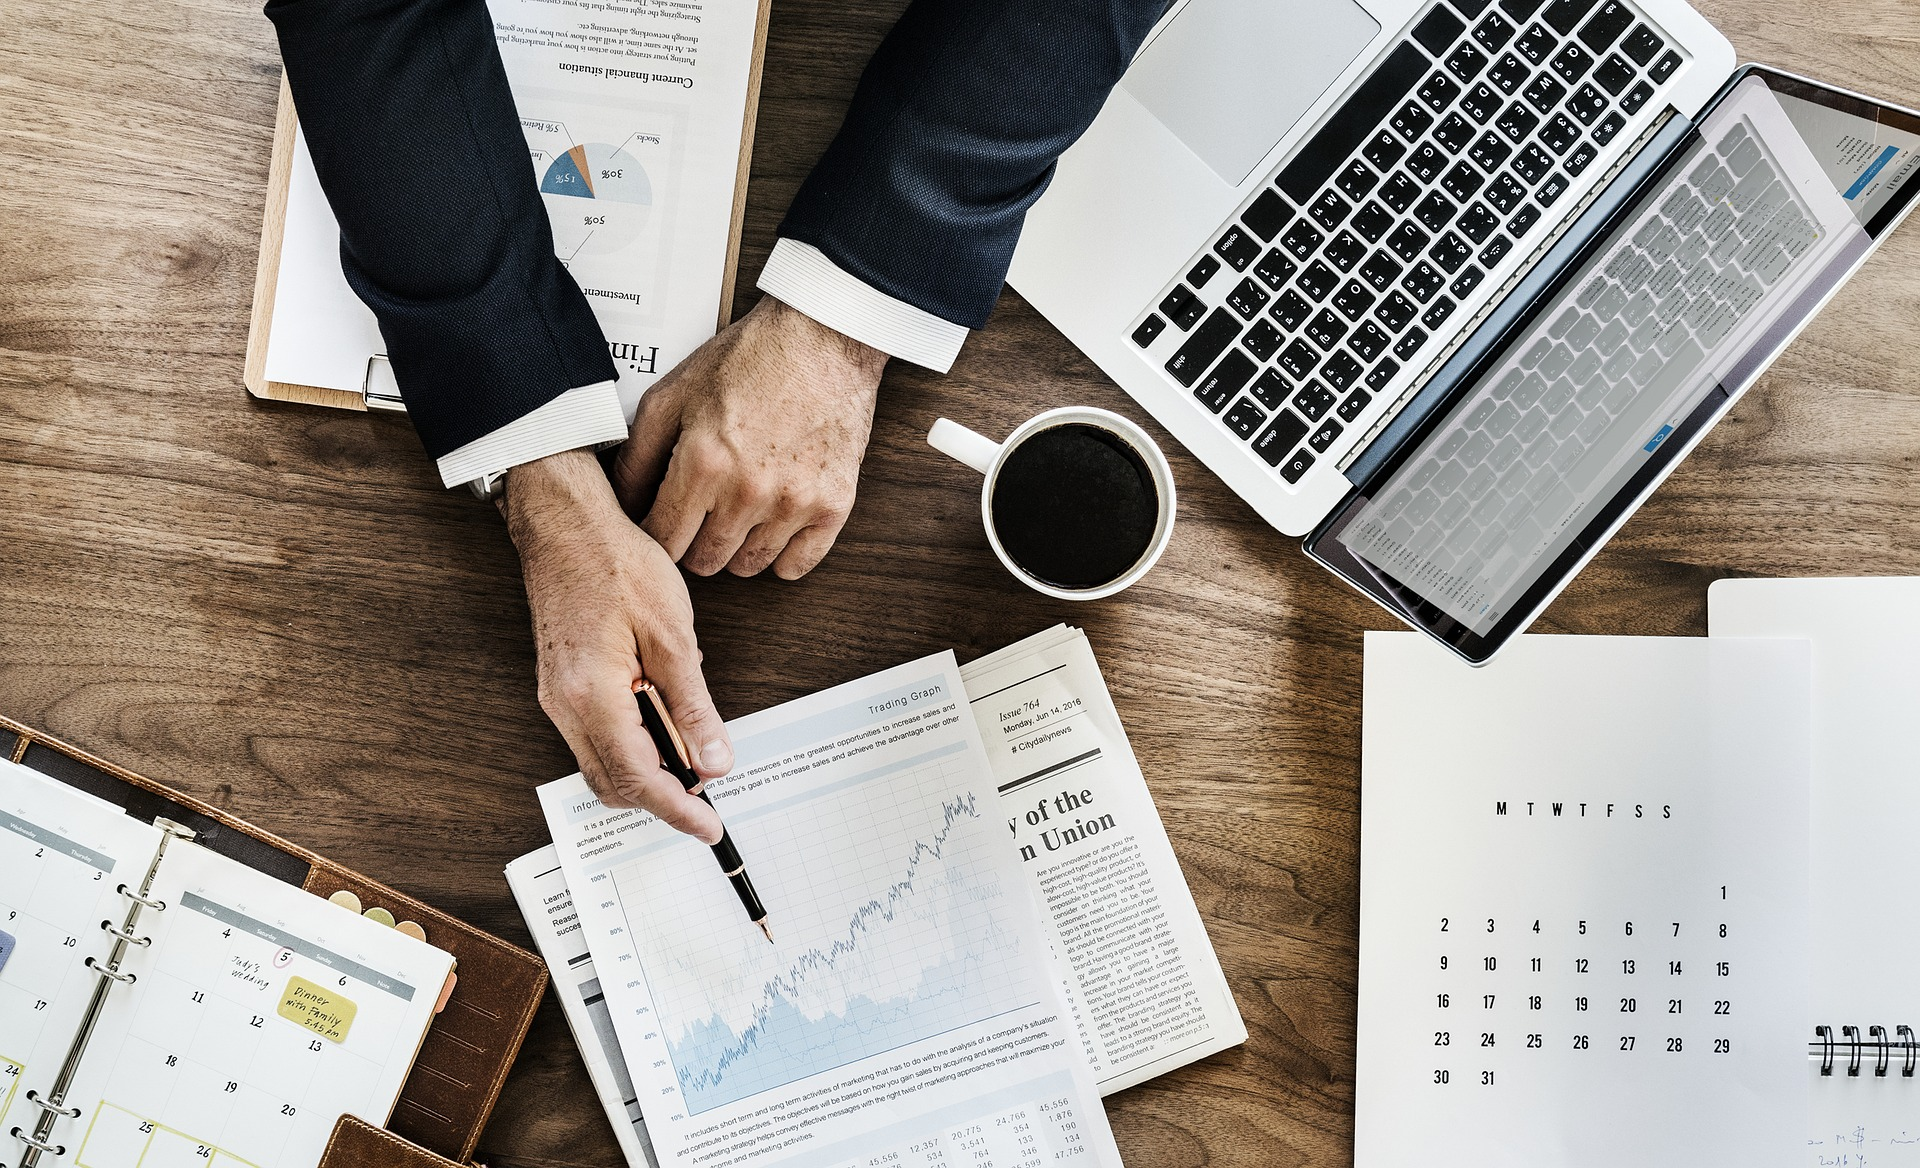 biuro rachunkowe rumia